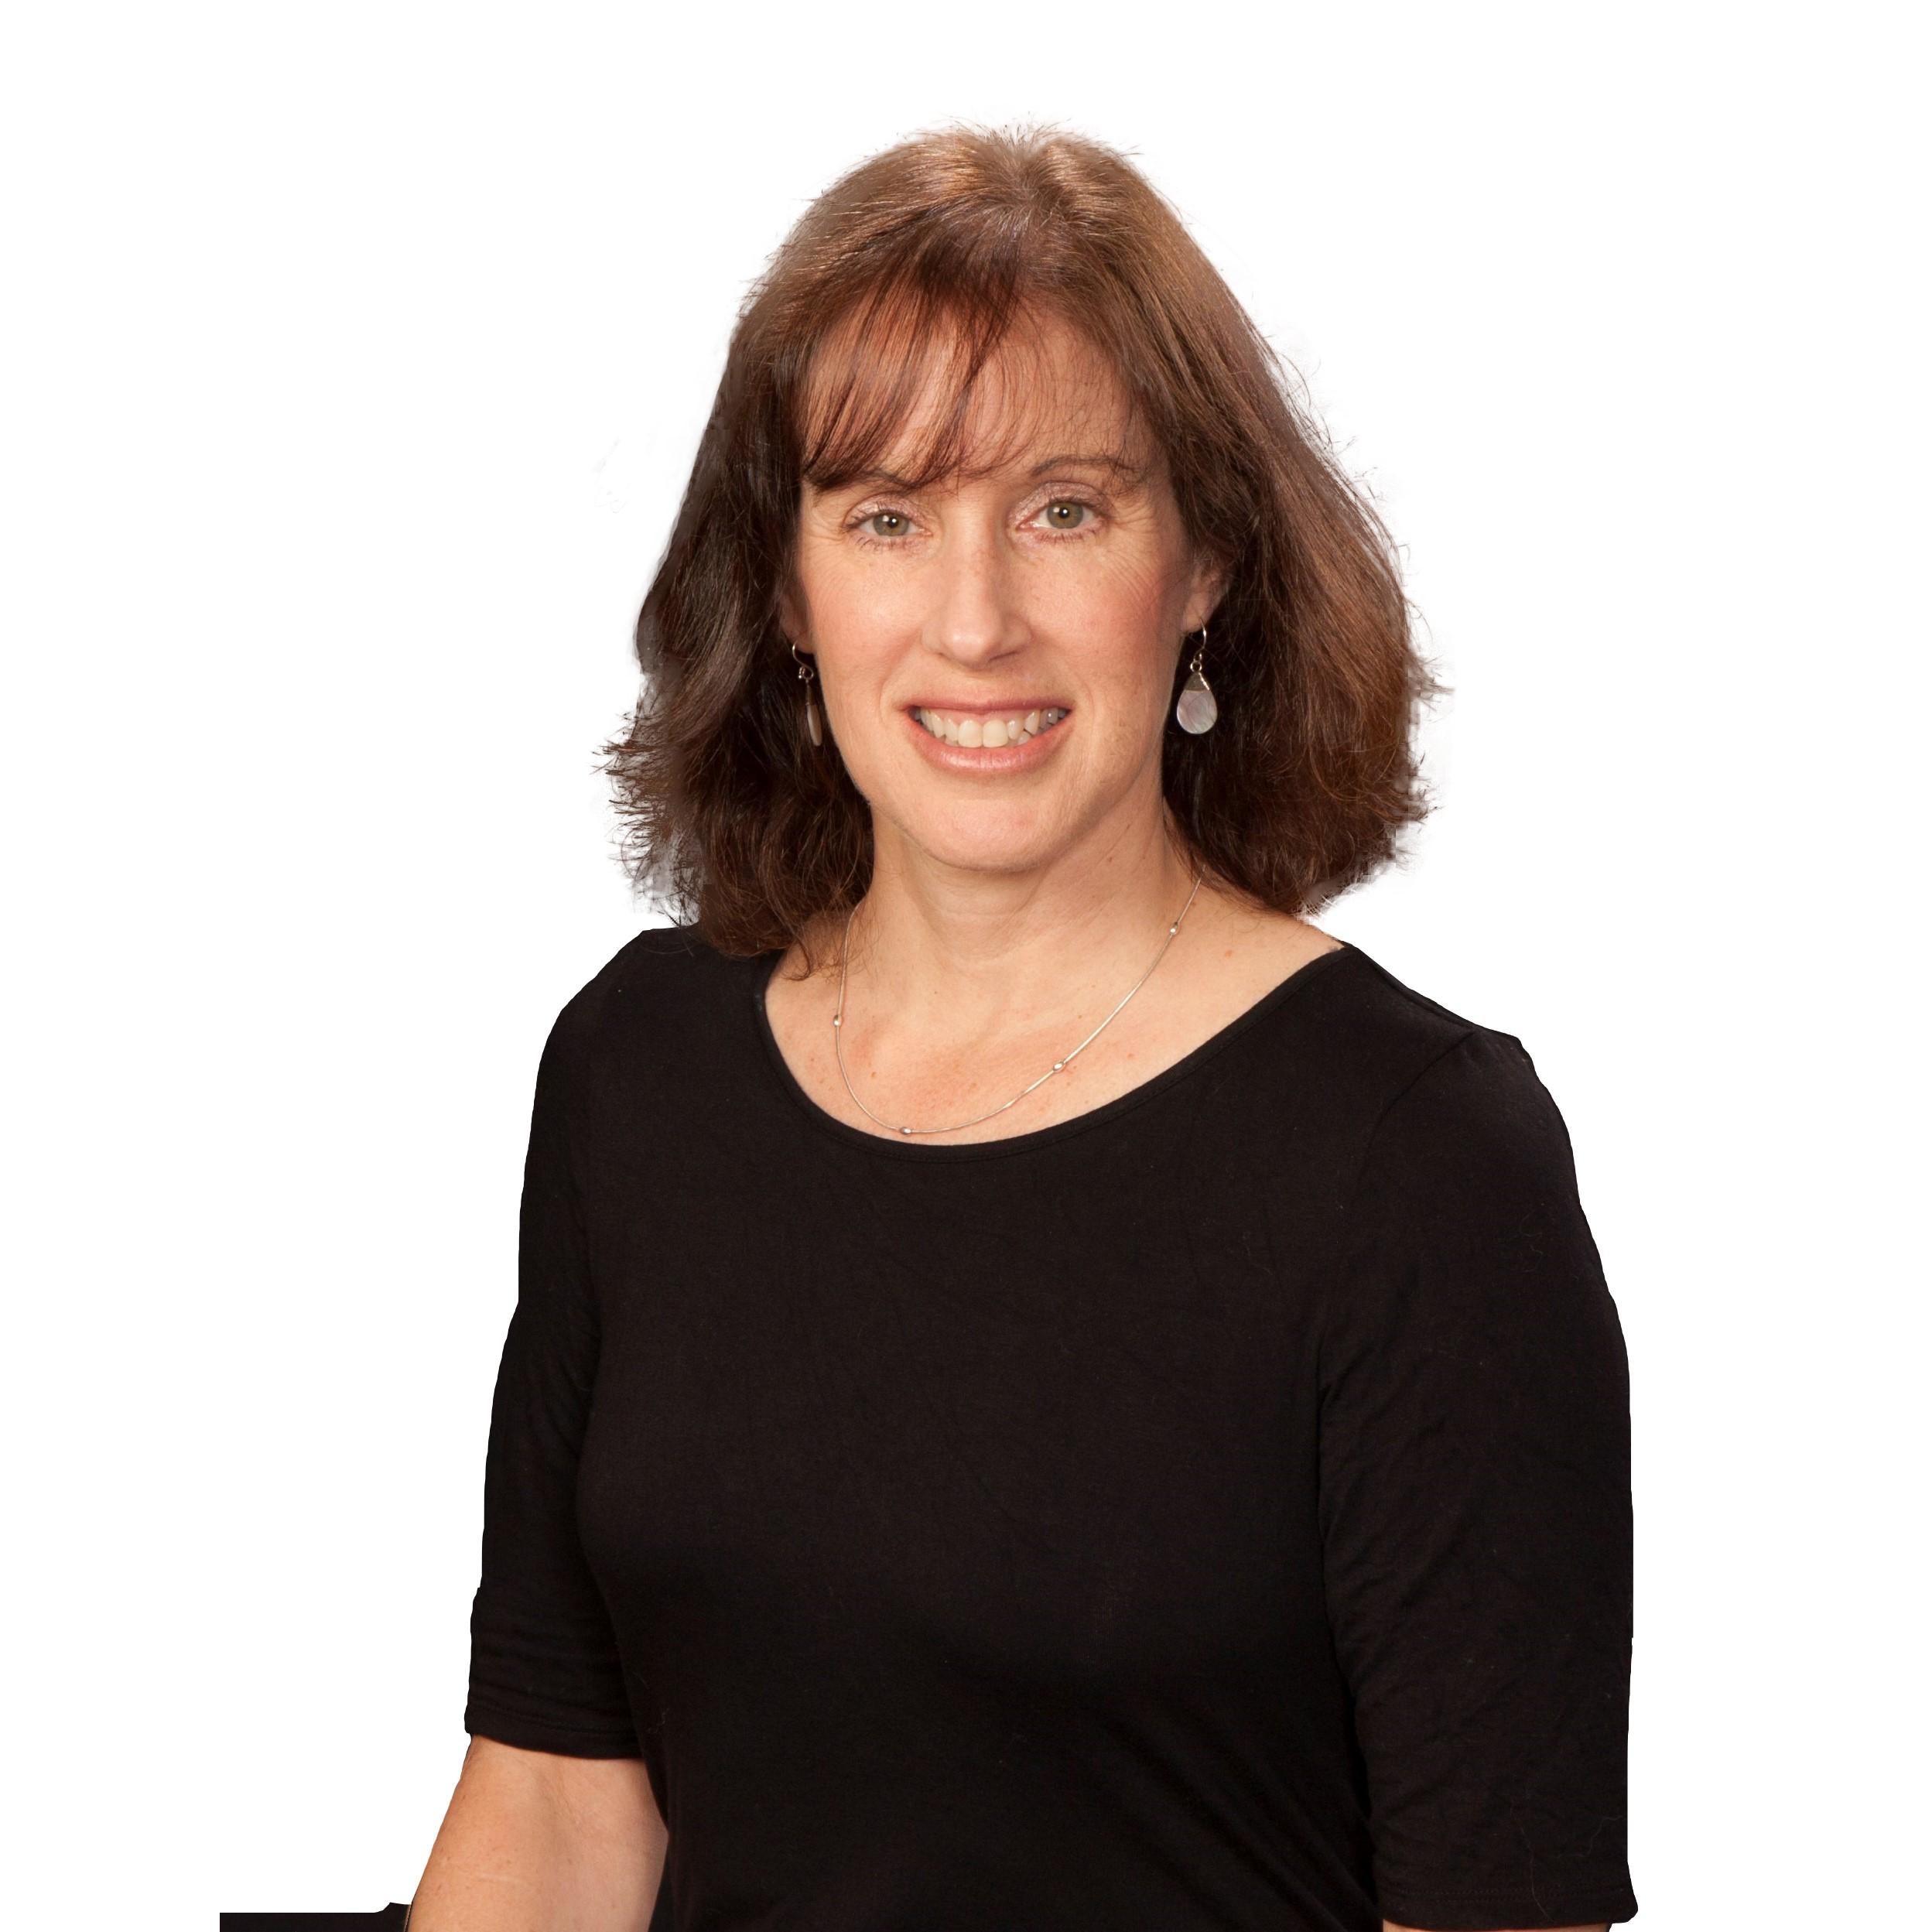 Erin Moran, CFO/CAO